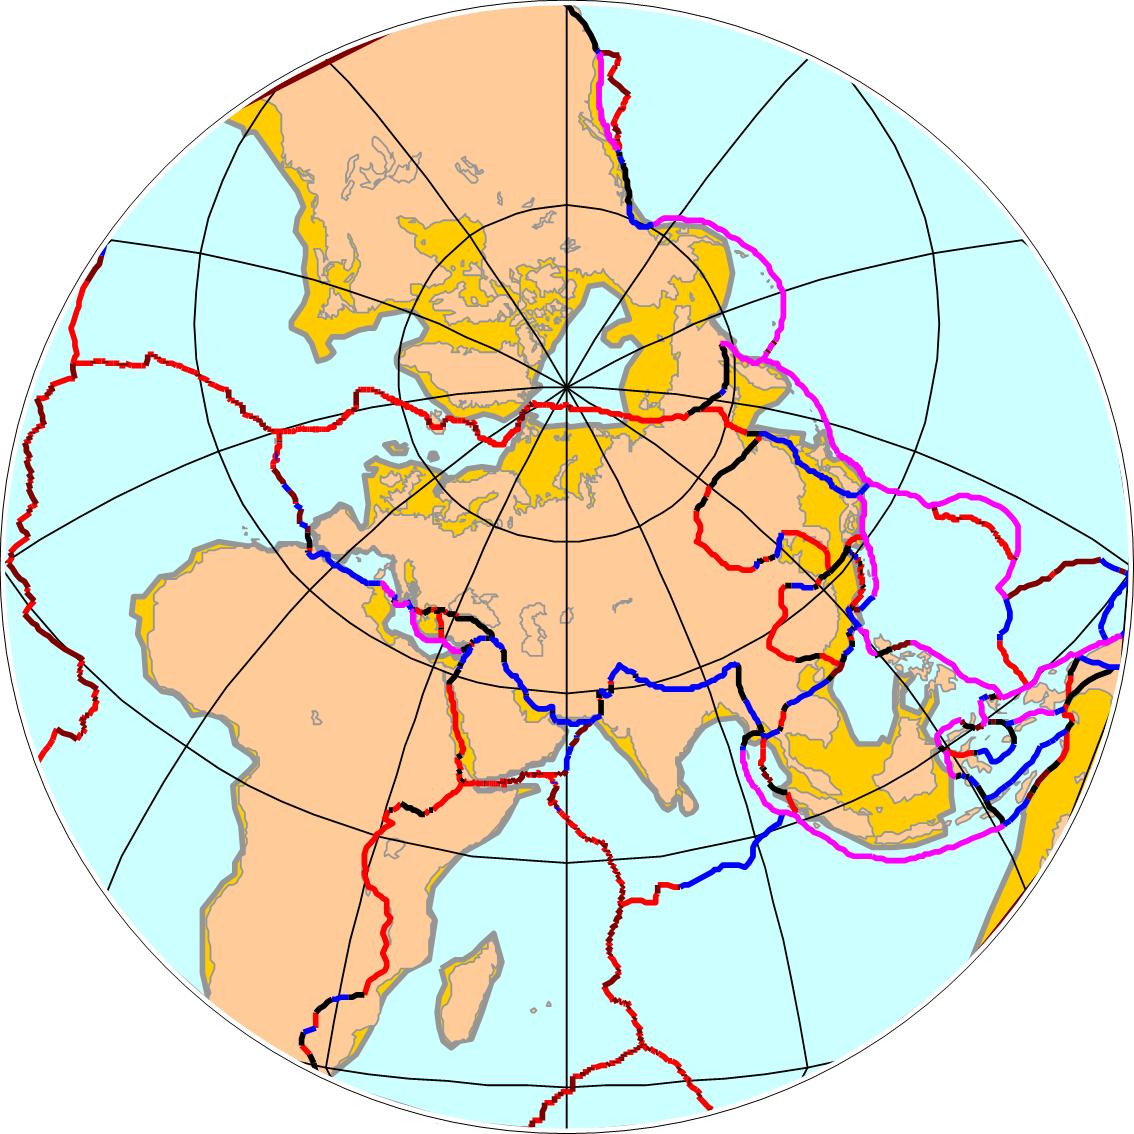 File:Eurasian plate.PNG.